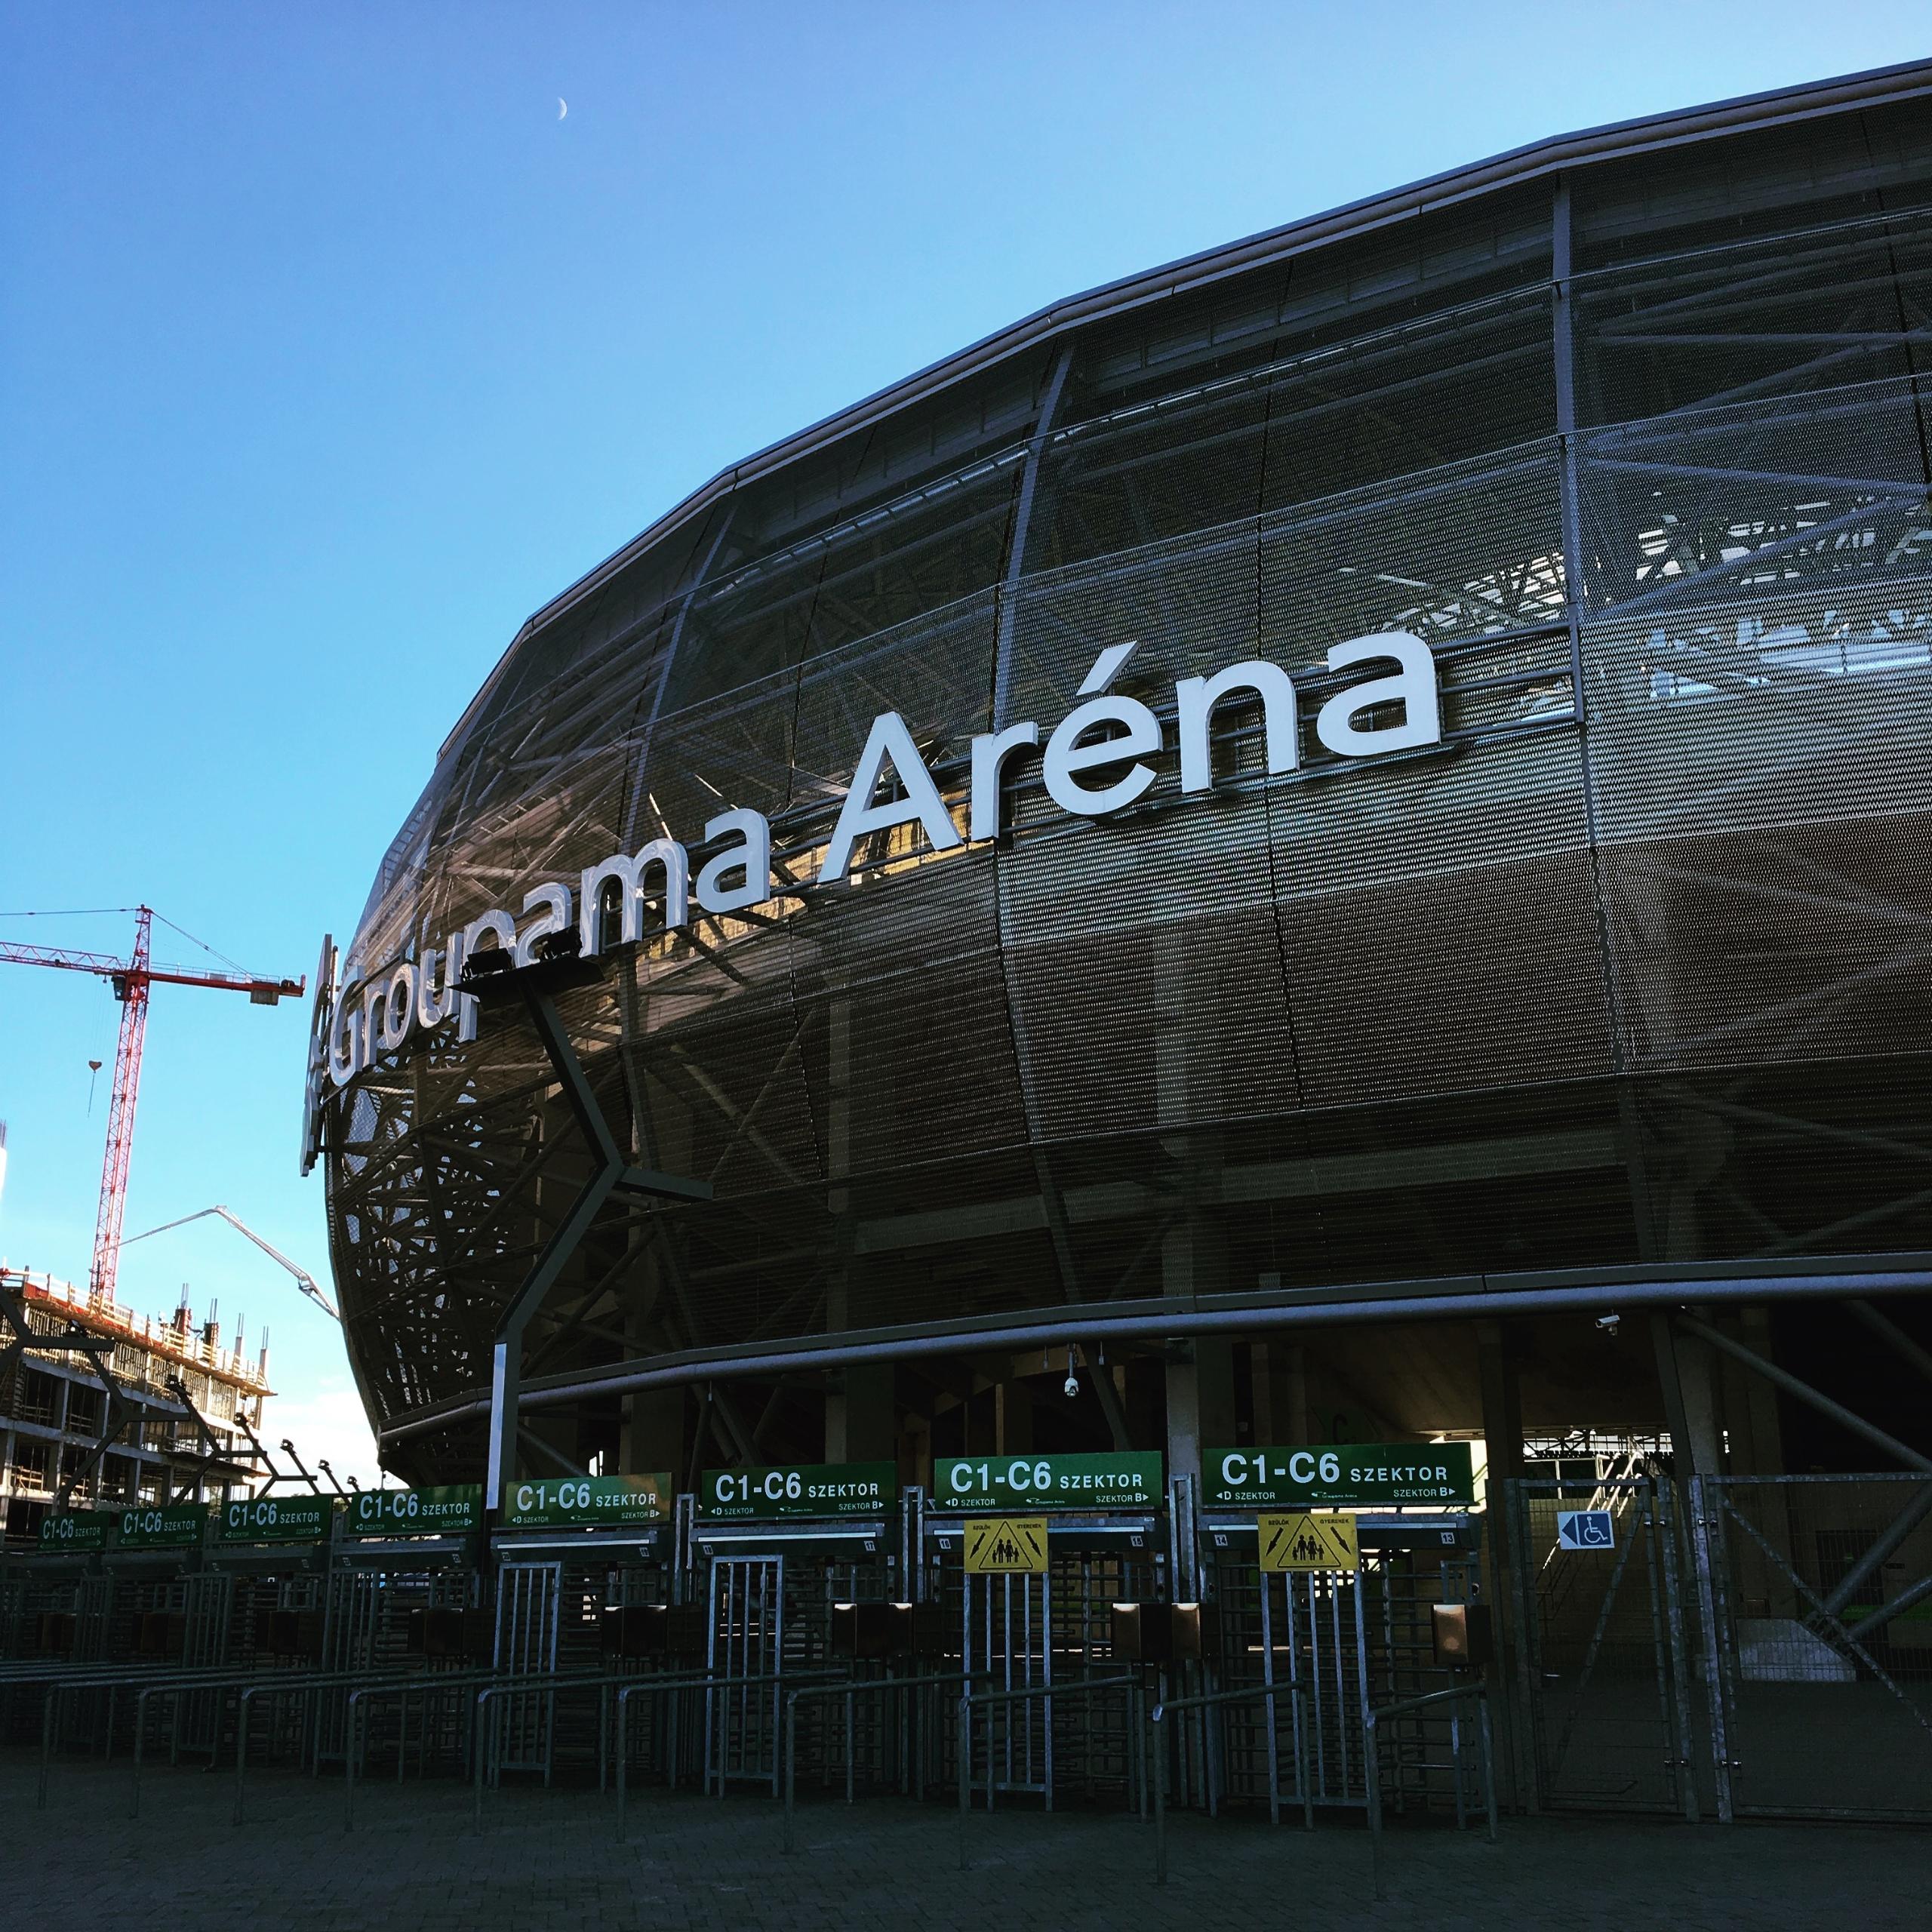 Goupama Arena Budapest ufo pass - stigergutt | ello